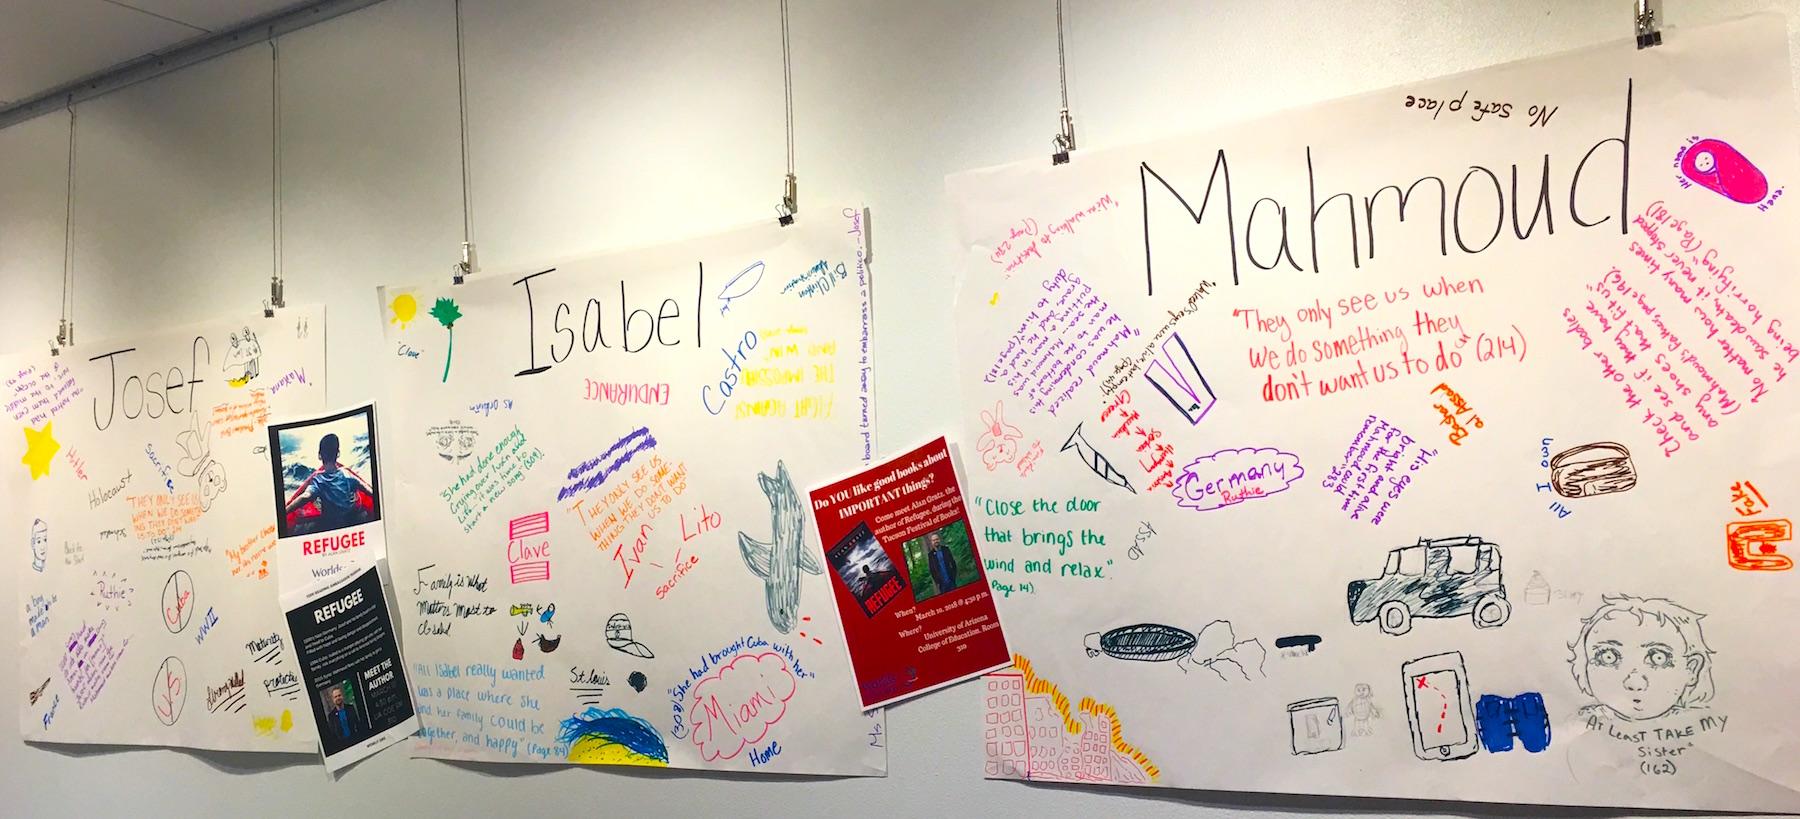 Teen Reading Ambassadors' Grafitti Walls